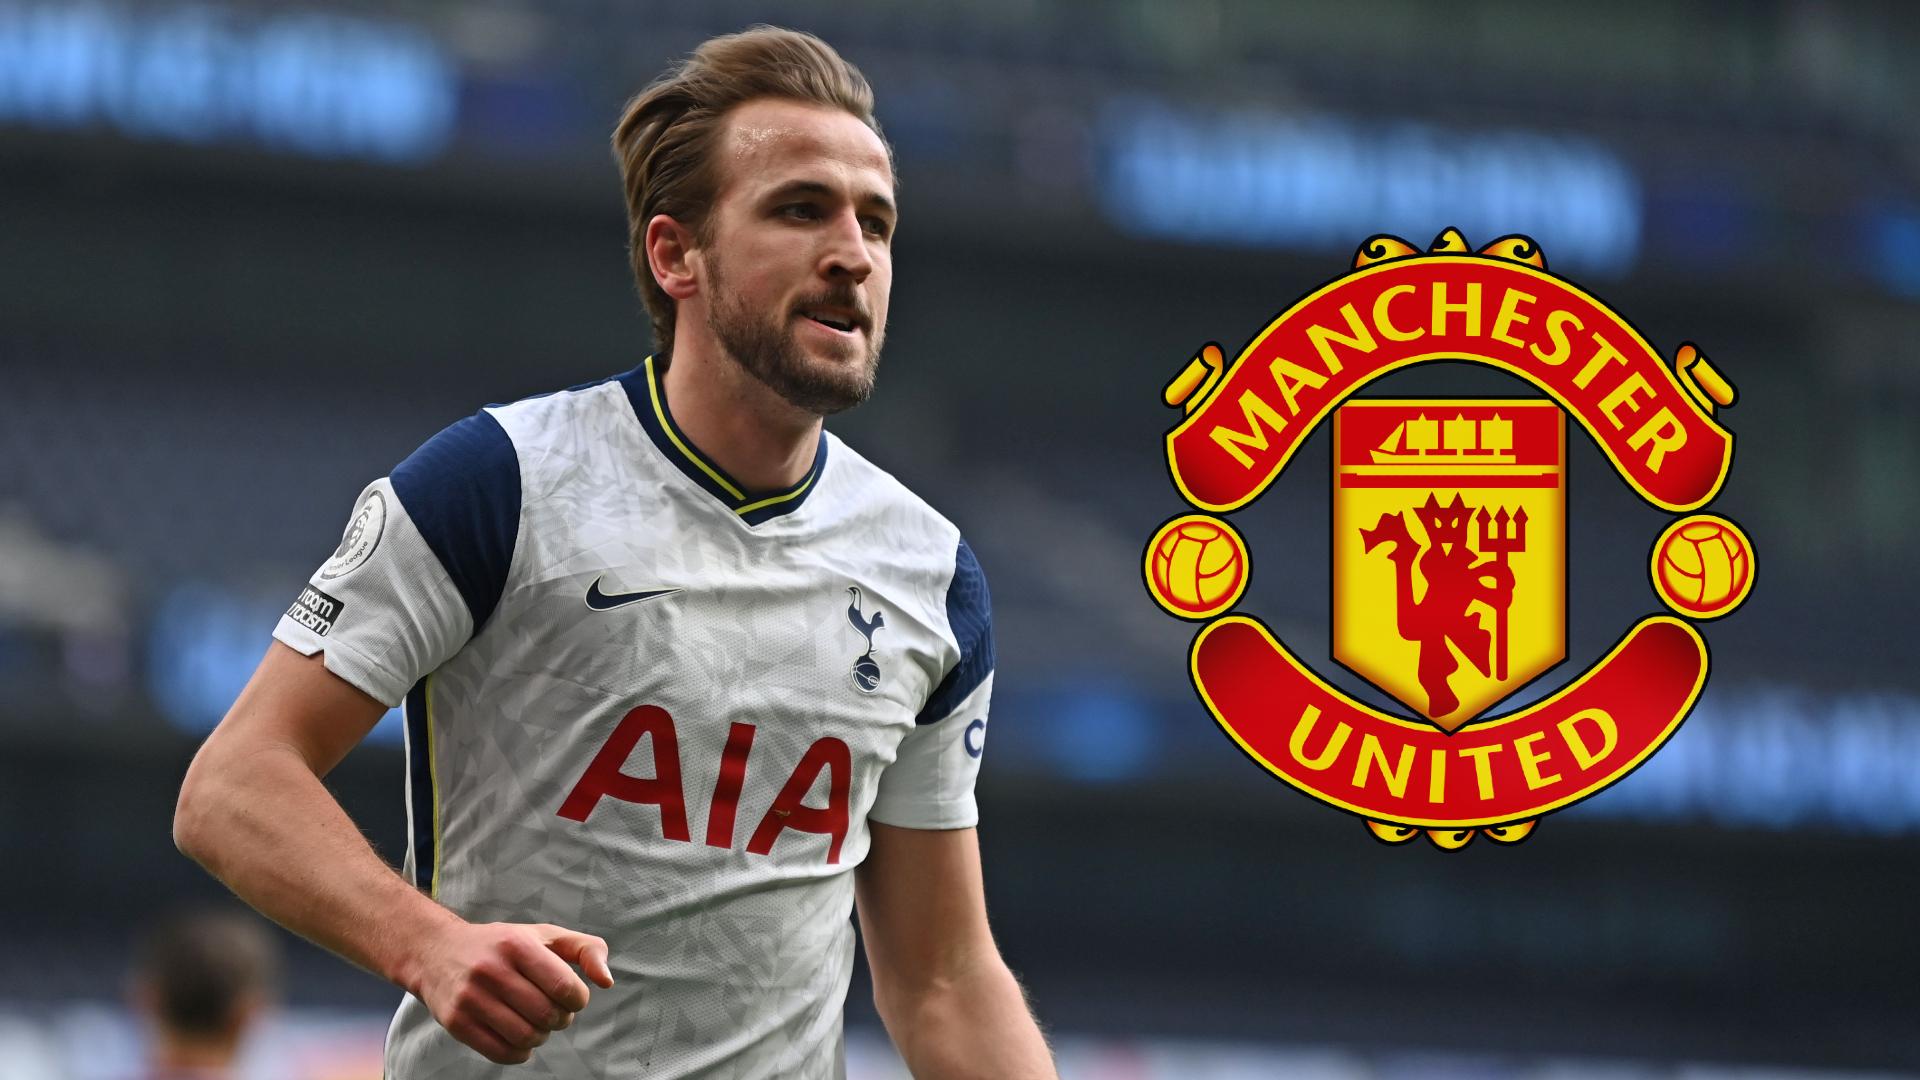 Transfer news and rumours LIVE: Man Utd plot £90m Kane bid thumbnail